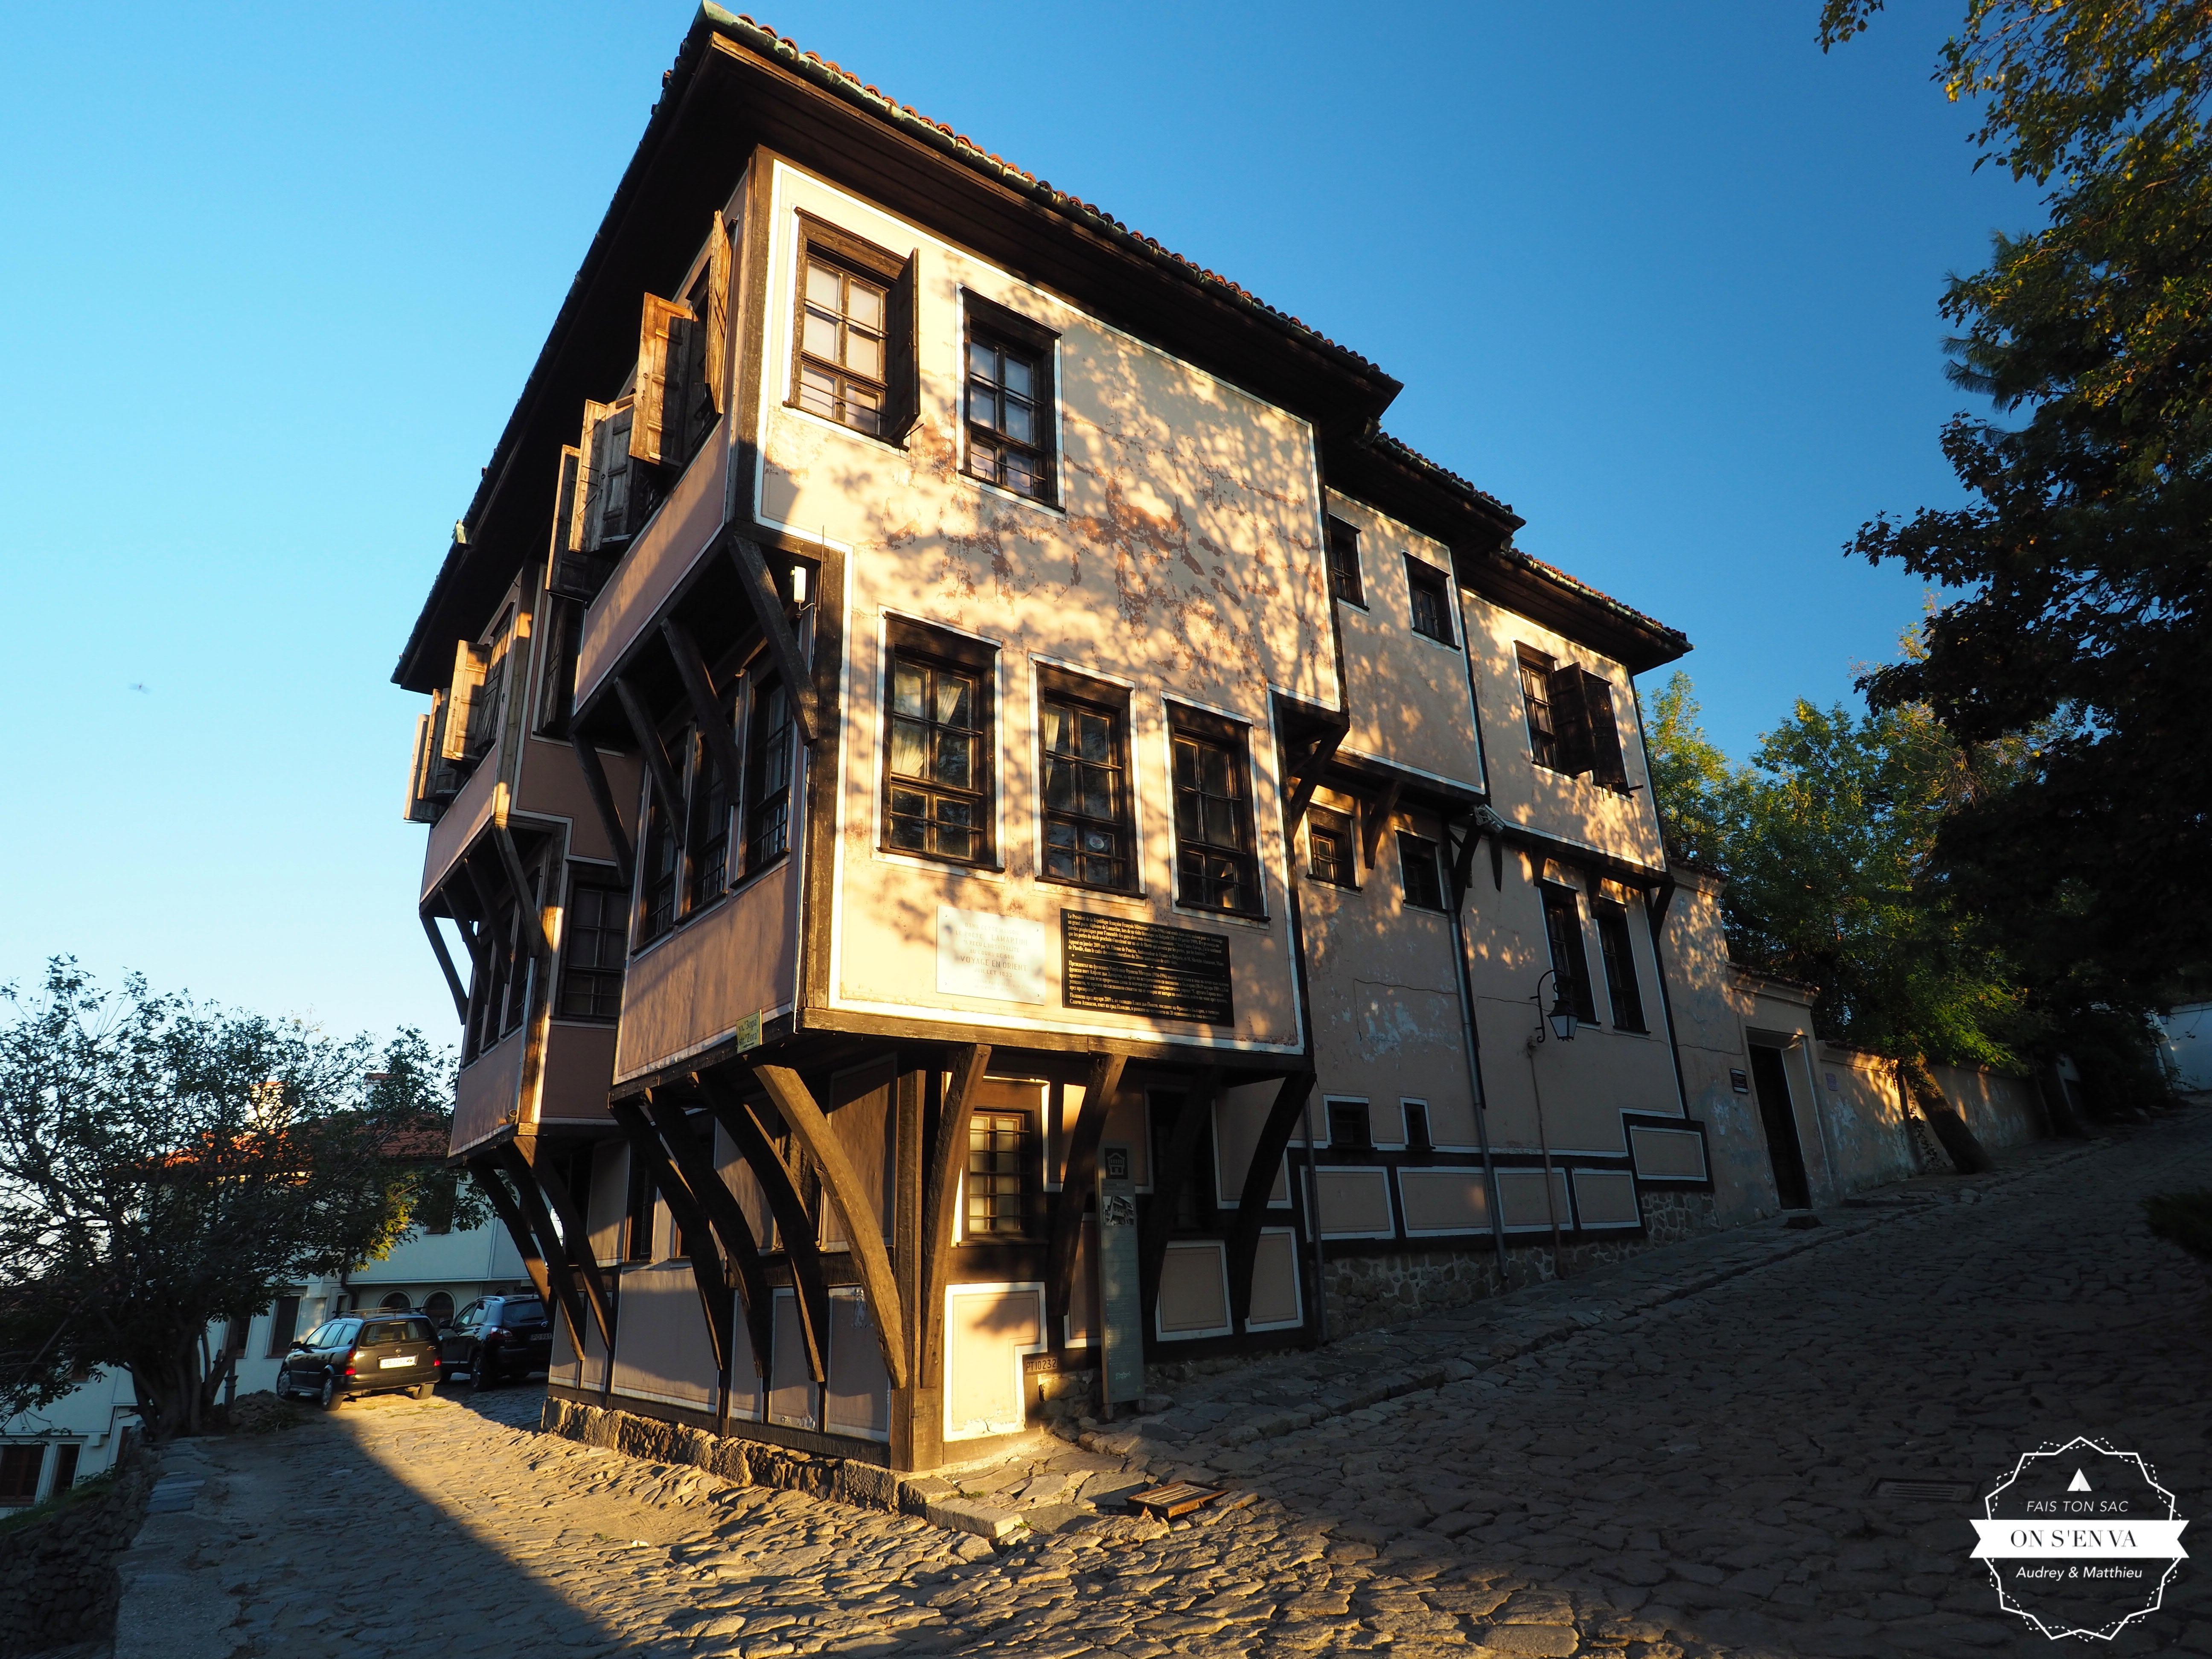 Maison où Lamartine a séjourné